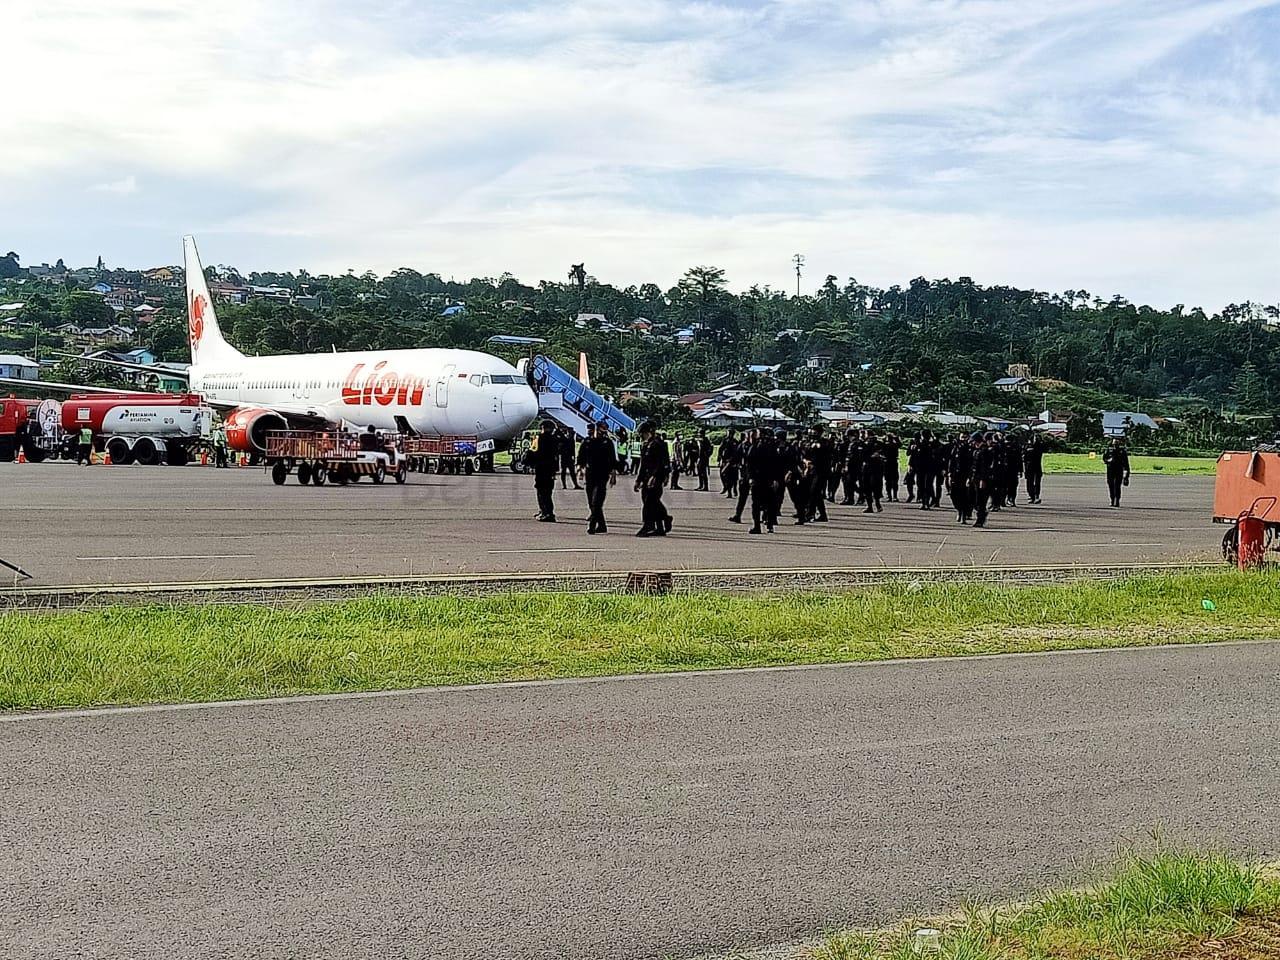 200 Personel Brimob Dari Kelapa Dua Jakarta Tiba di Papua Barat 1 IMG 20201206 WA0026